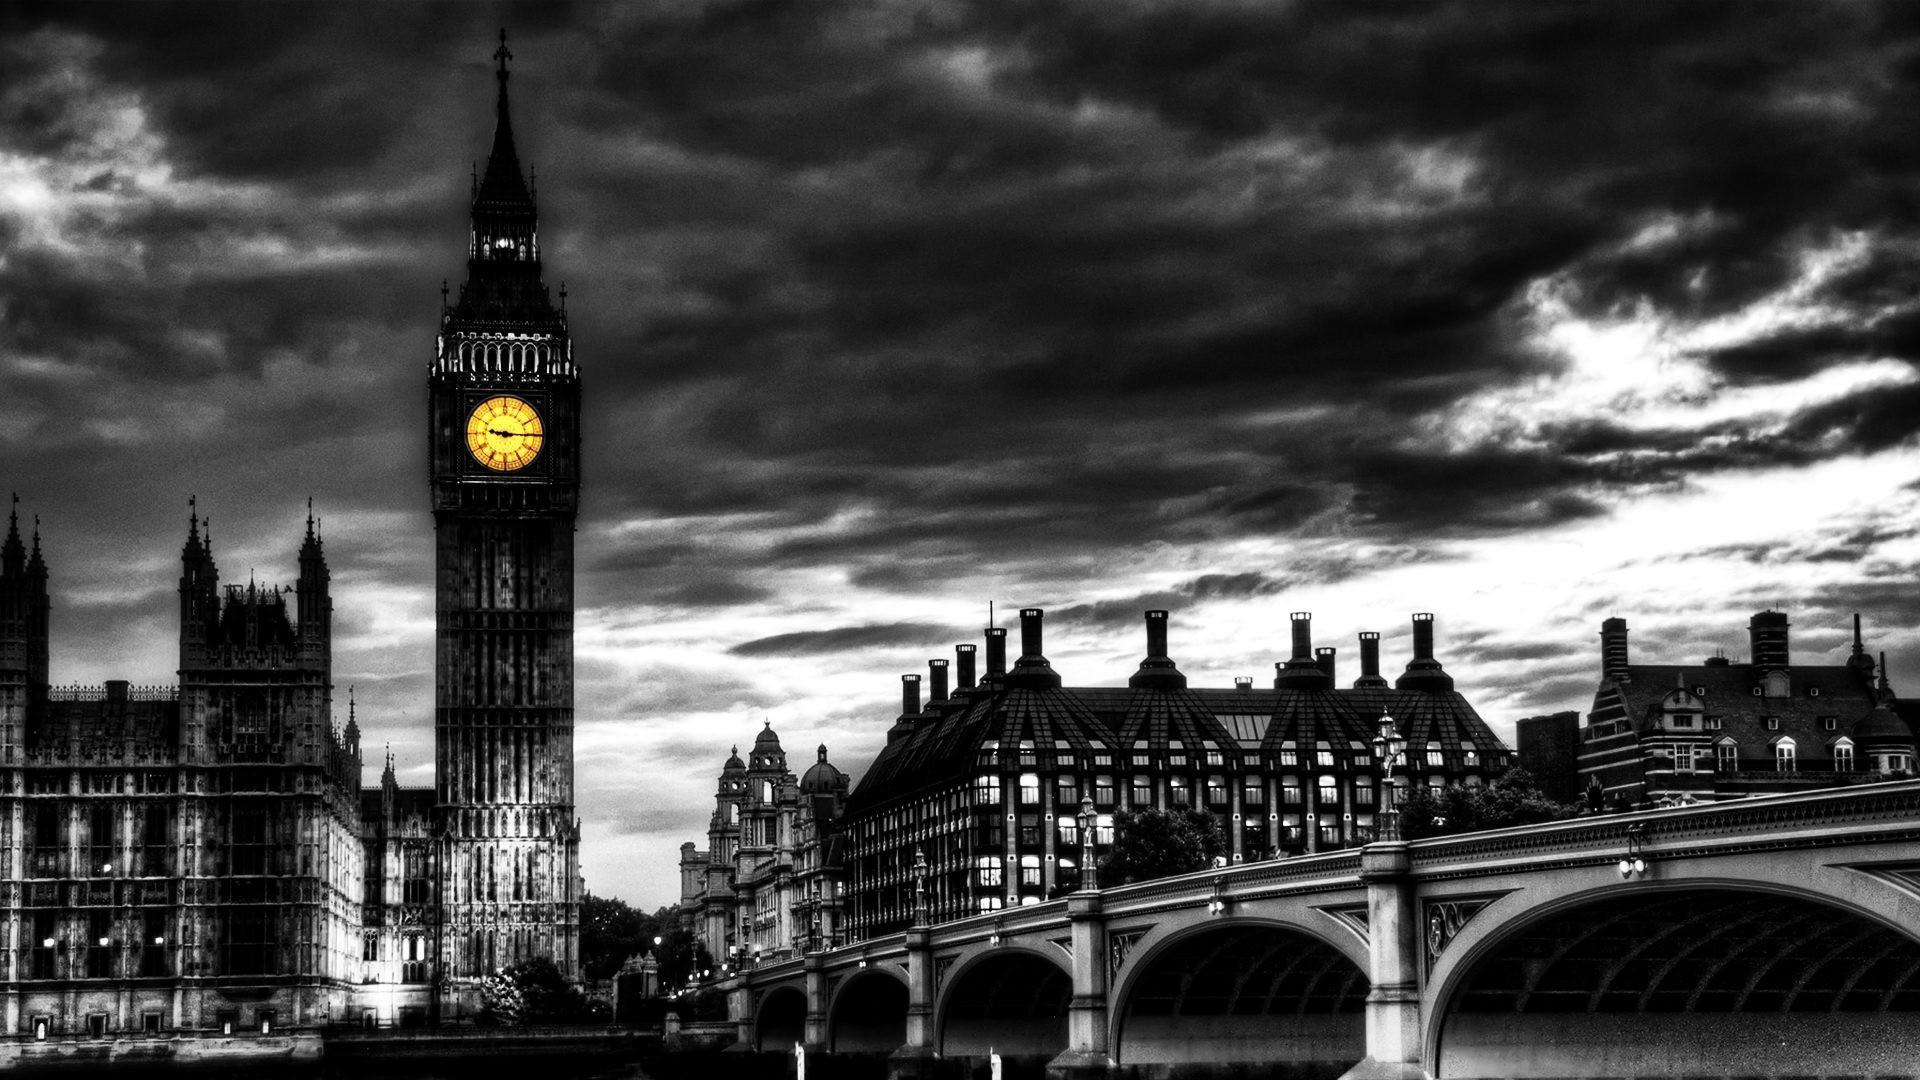 Download HD London Bridge Black And White Wallpaper WallpapersByte  1920×1200 London Black And White Wallpapers (37 Wallpapers) | Adorable  Wallpape…